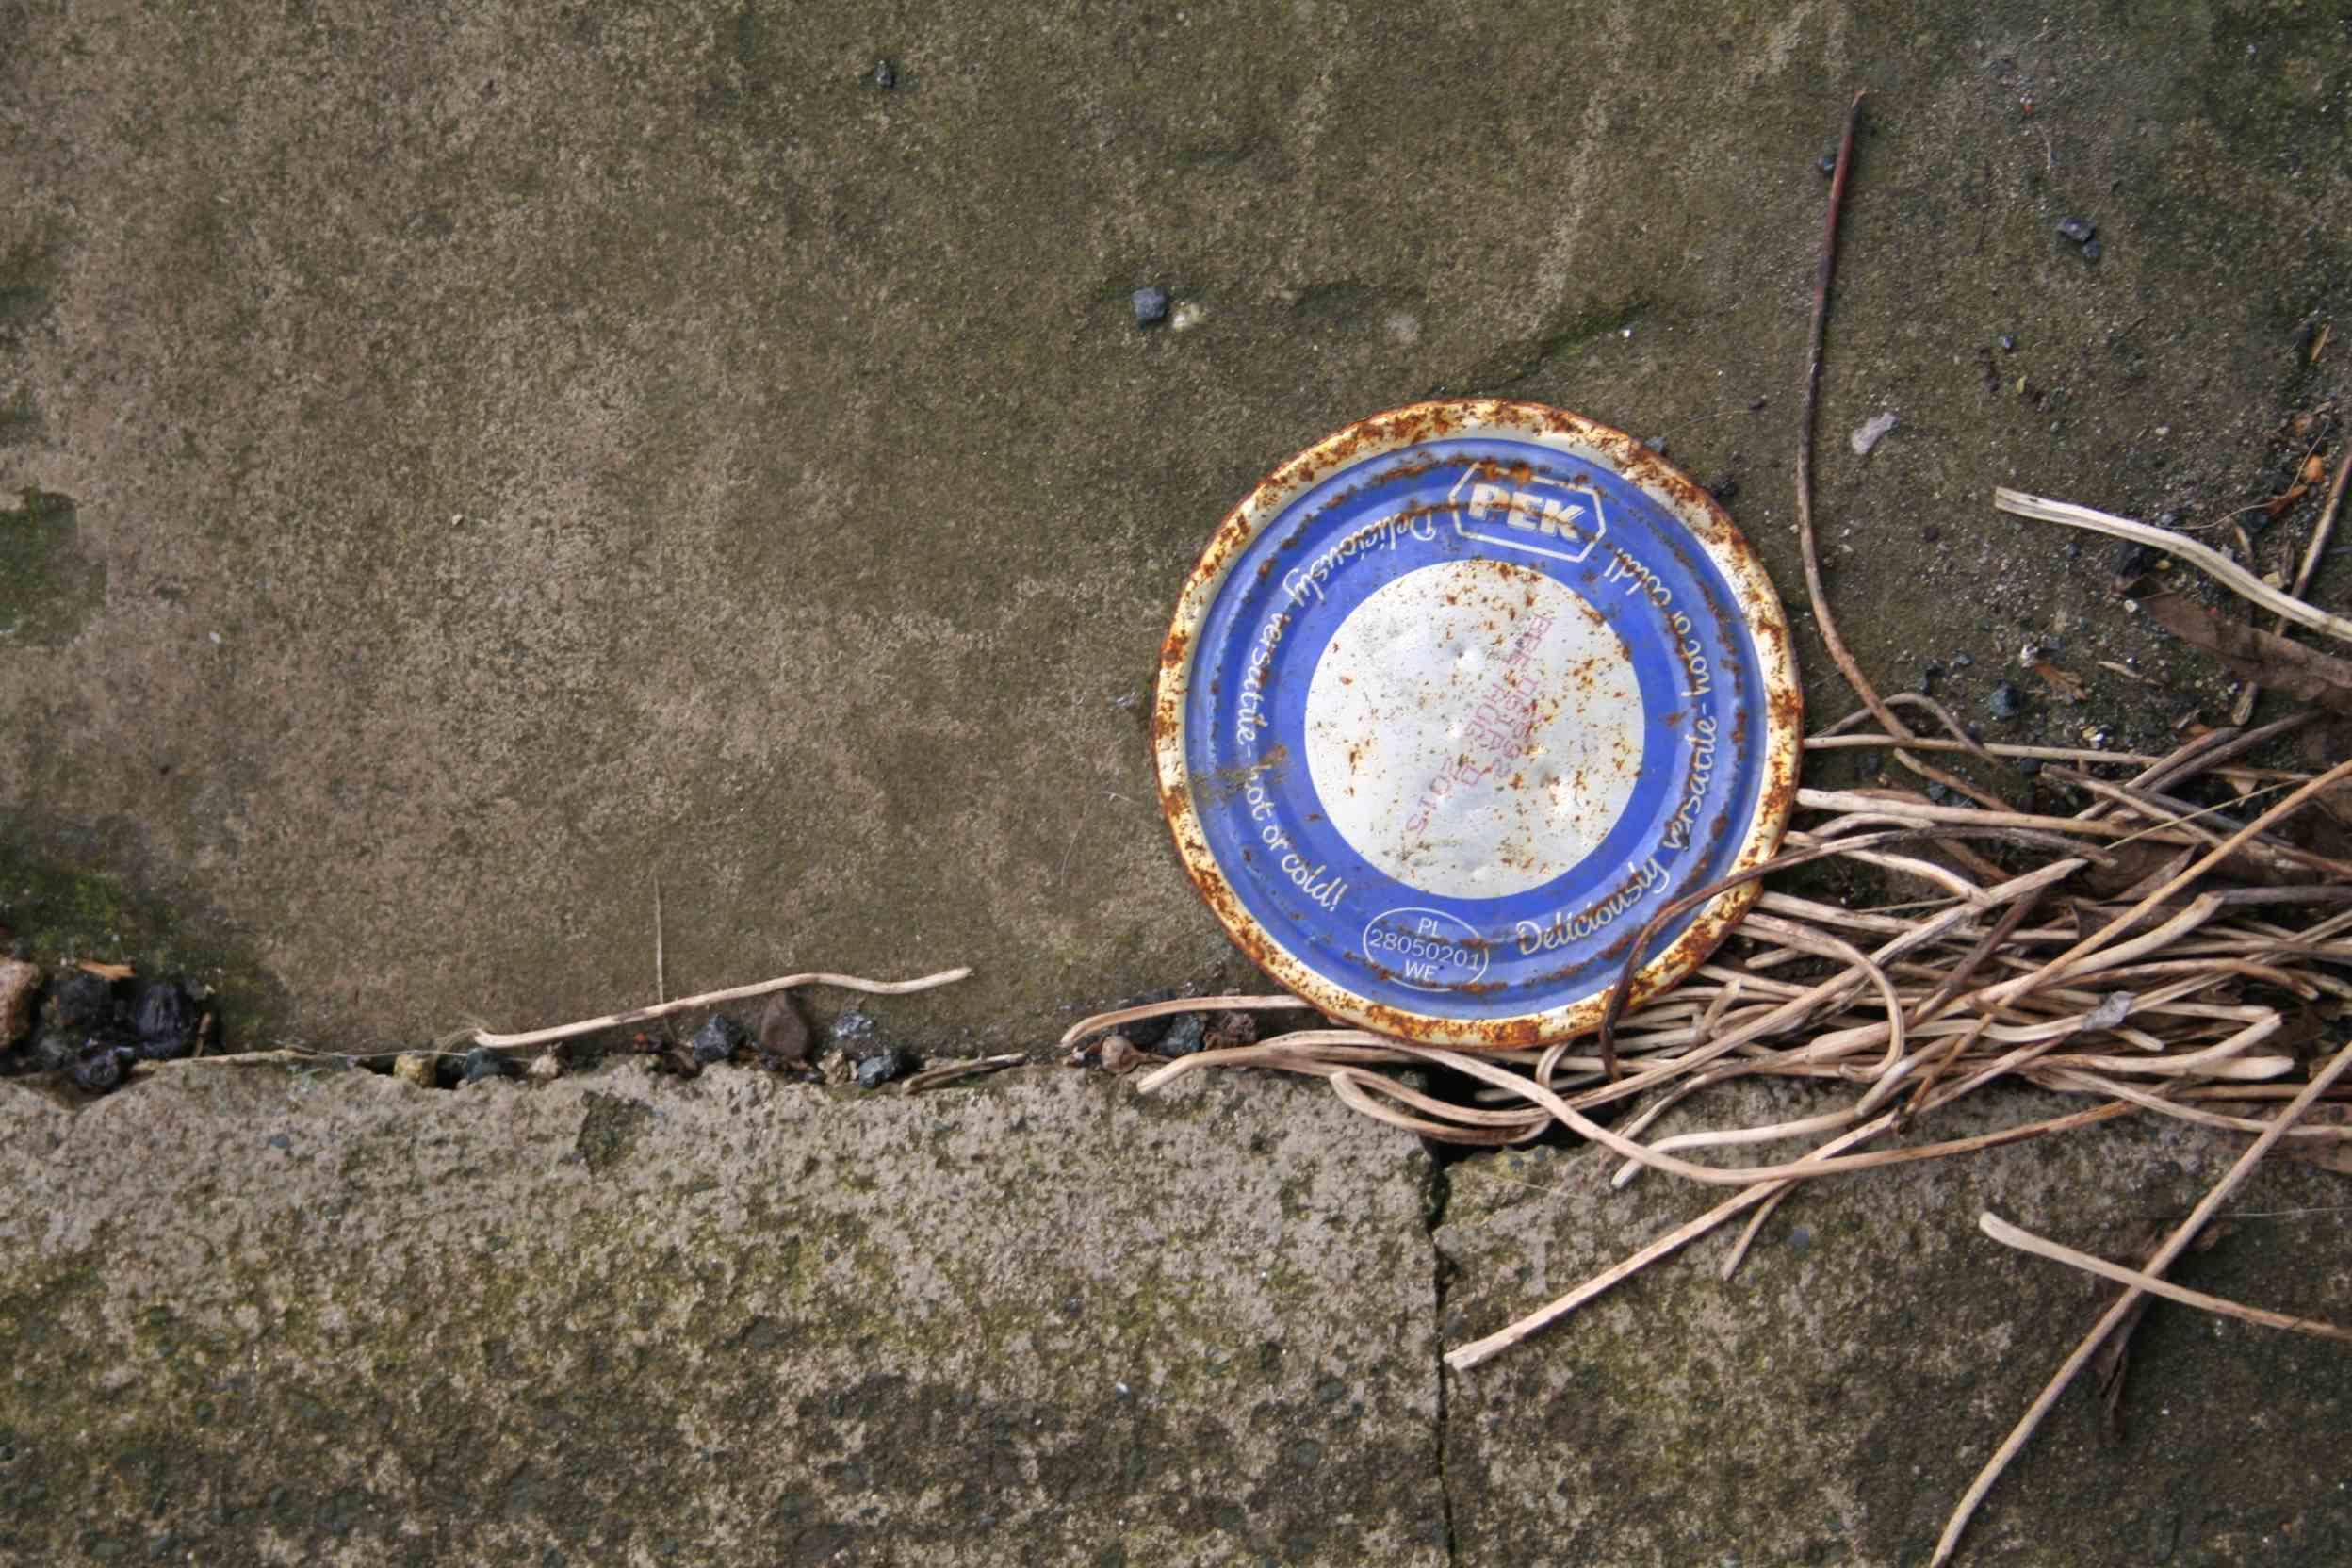 Alice Fox pavement marks 11